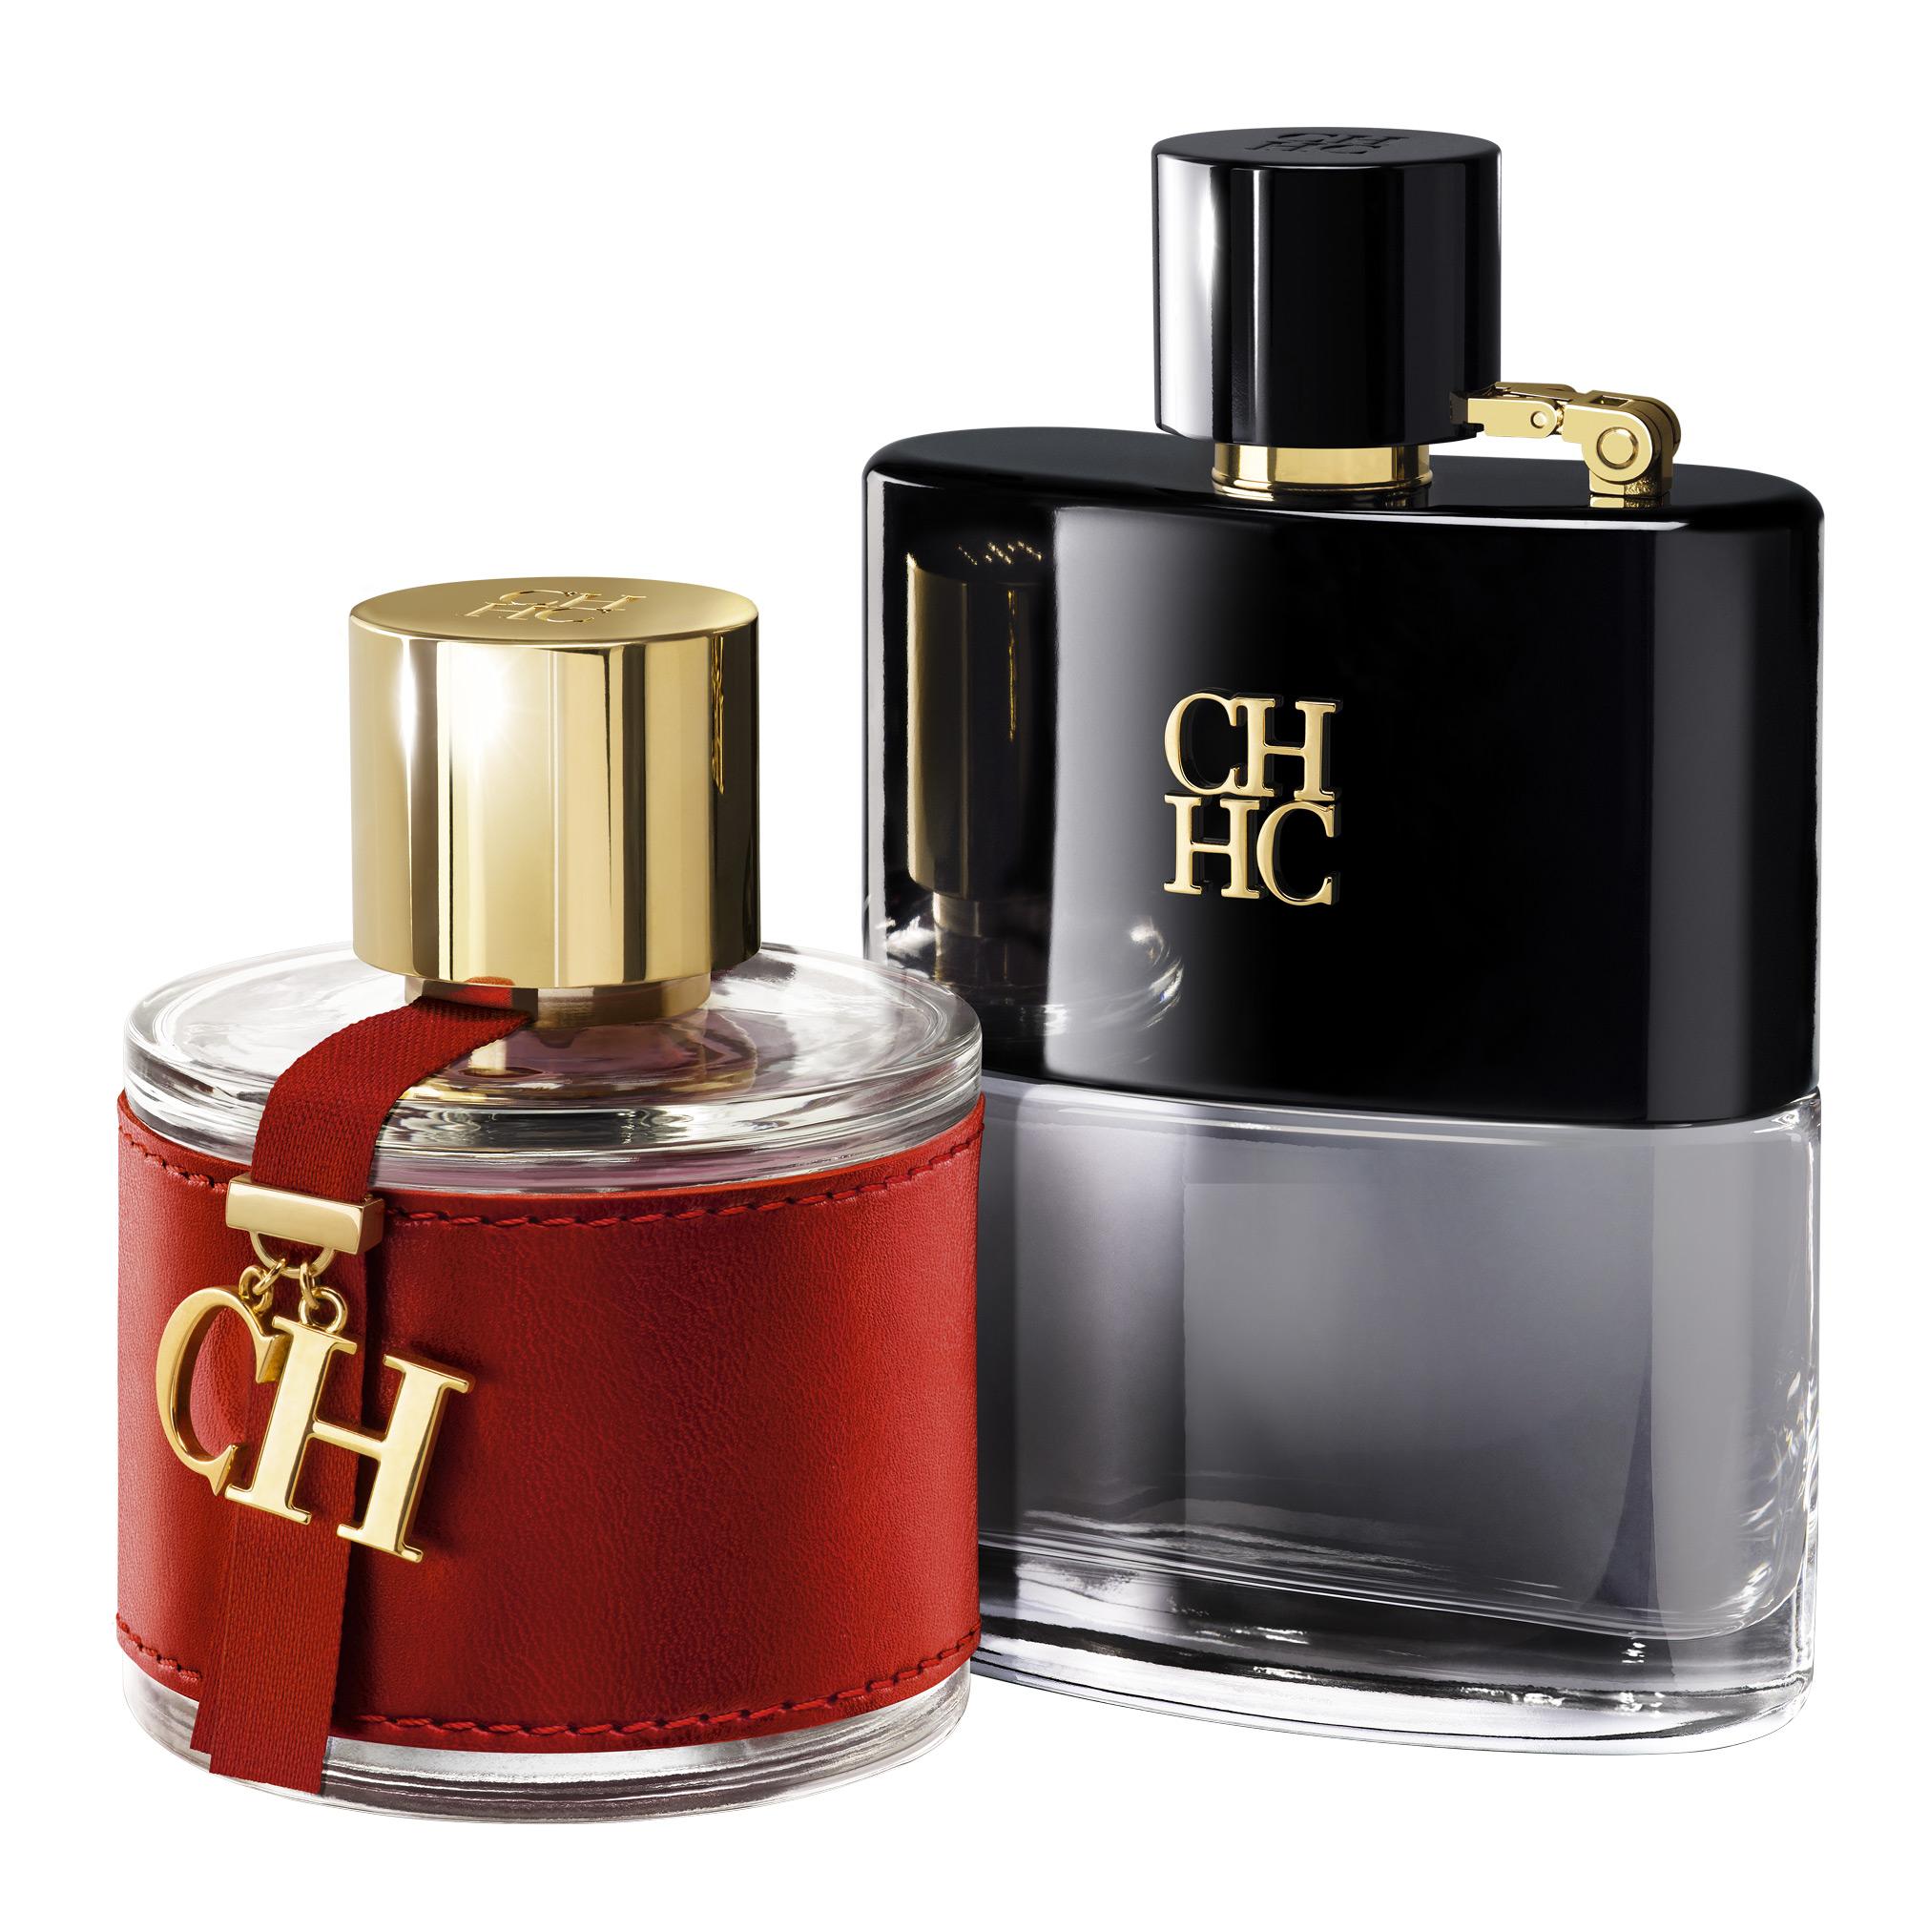 Ch 2015 Carolina Herrera Perfume A Fragrance For Women 2015